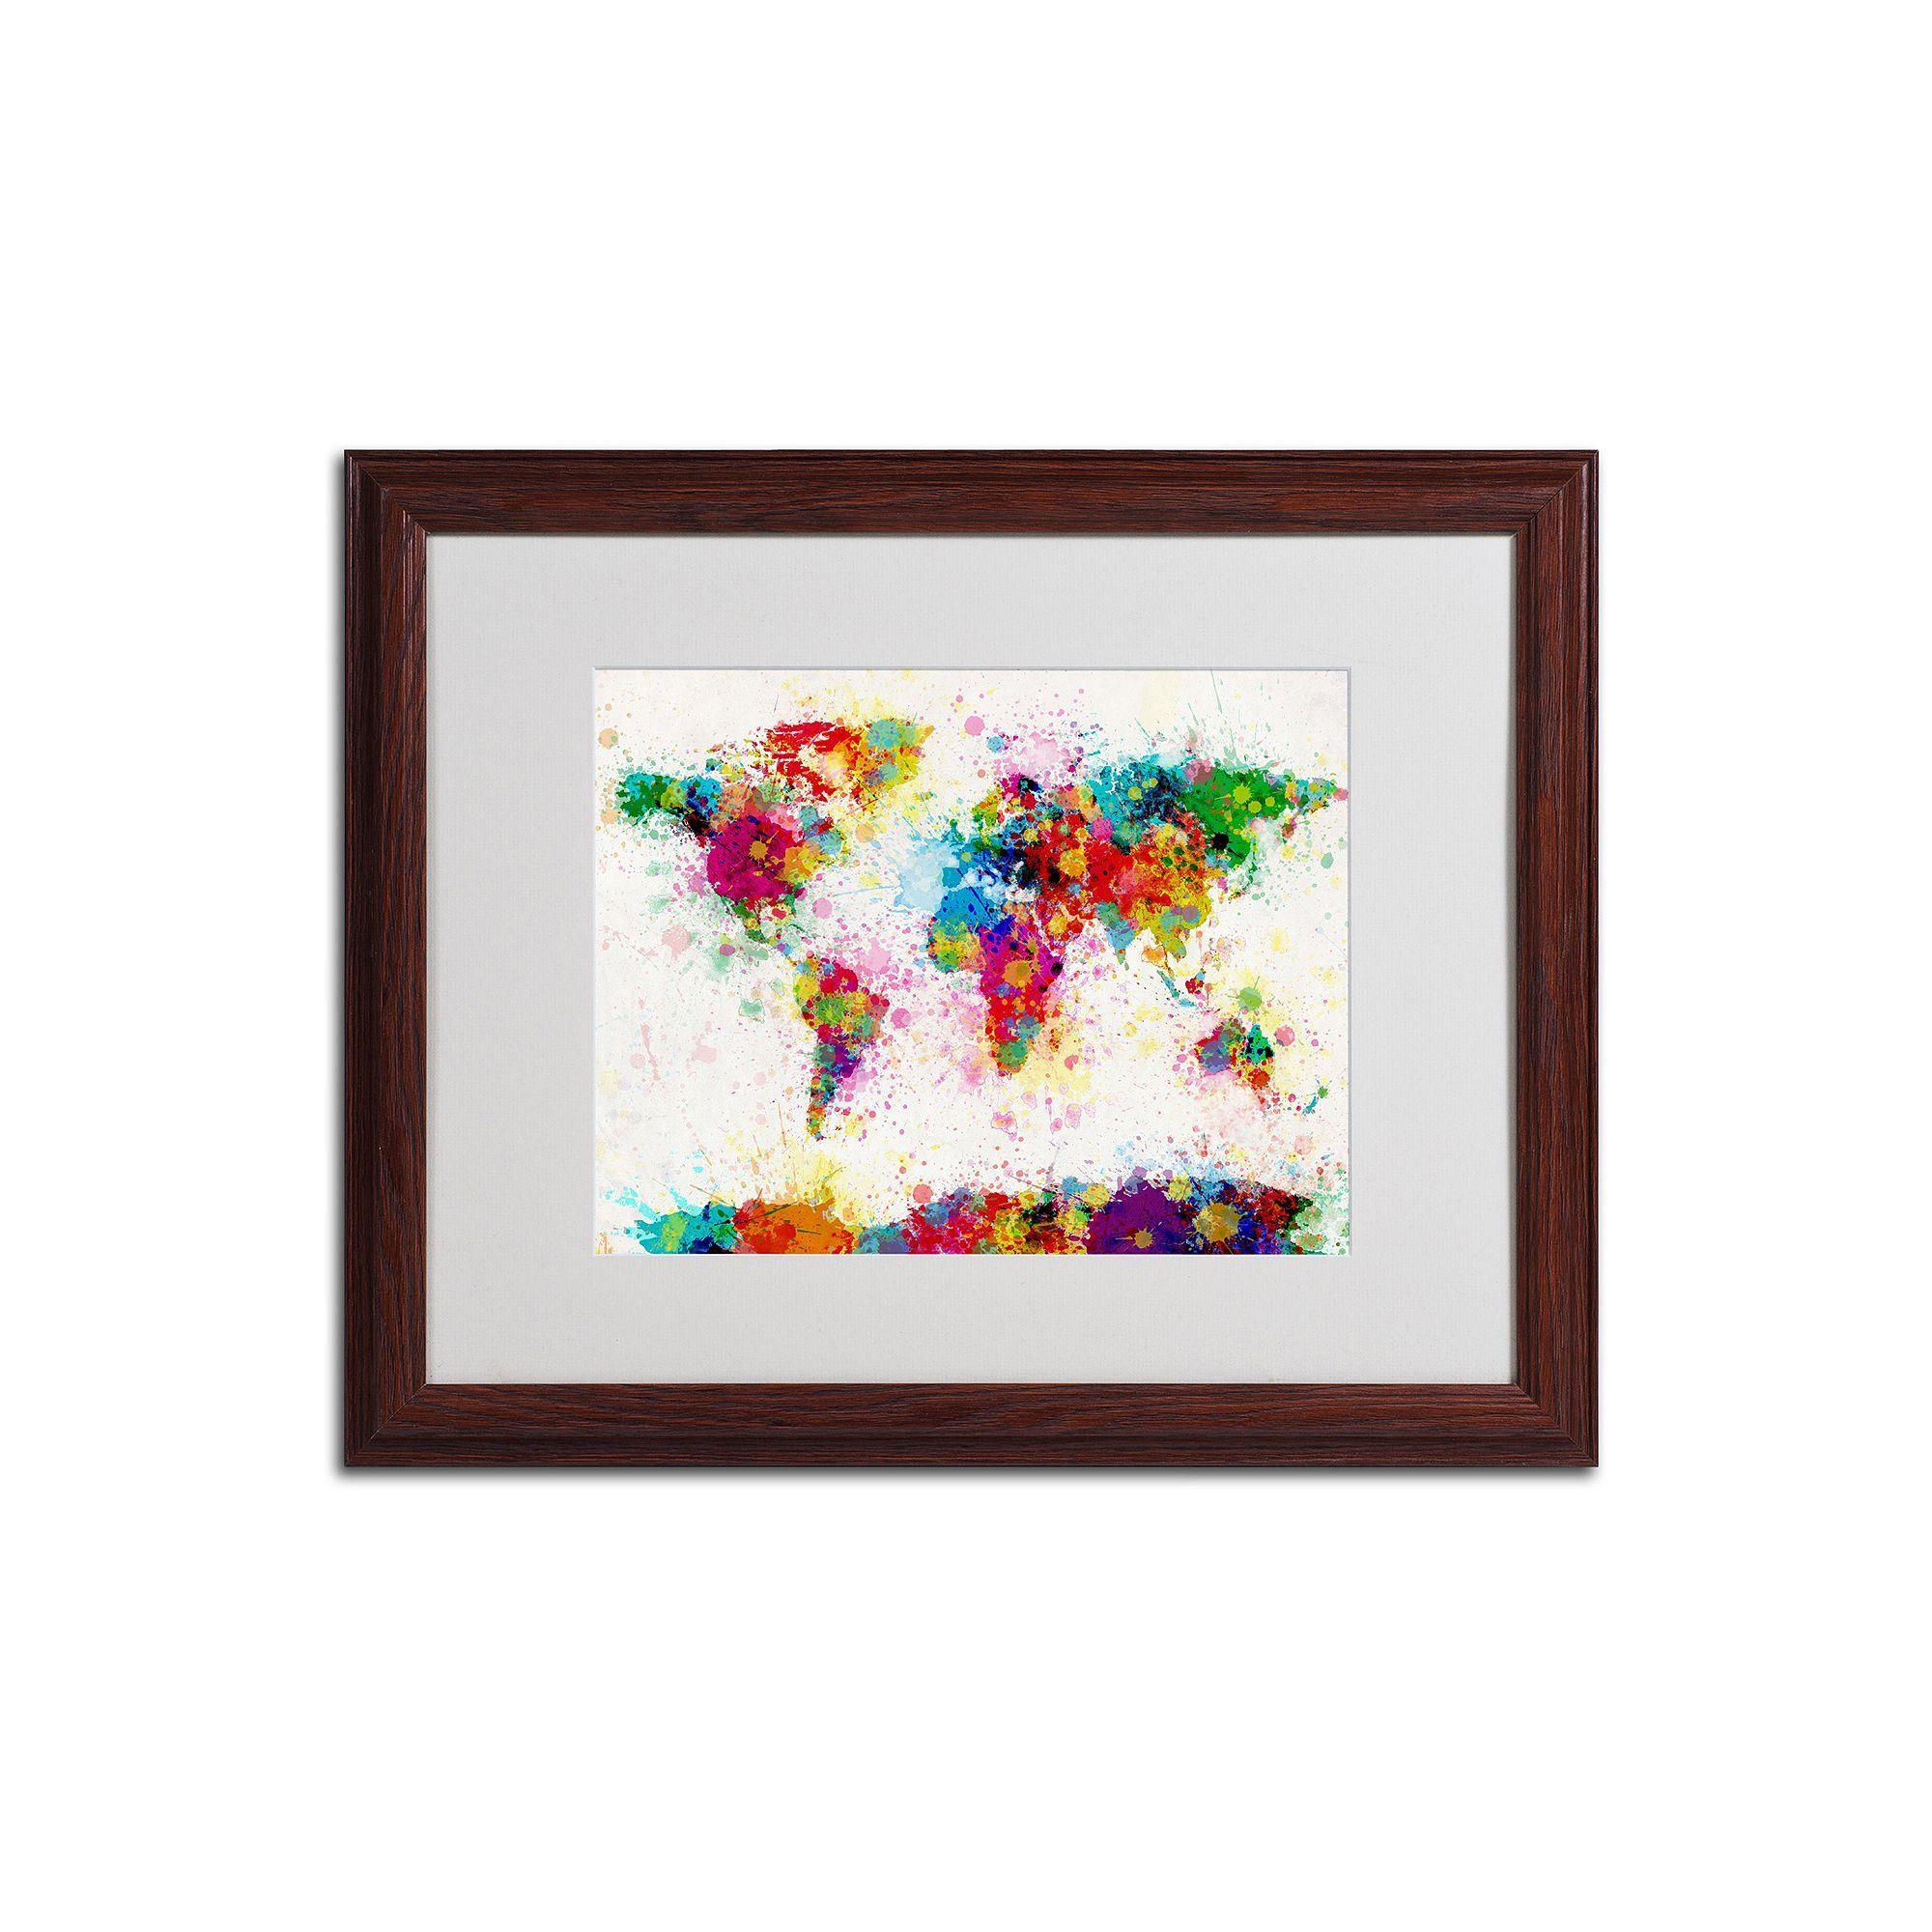 Trademark fine art world map paint wood finish framed wall art med yellow